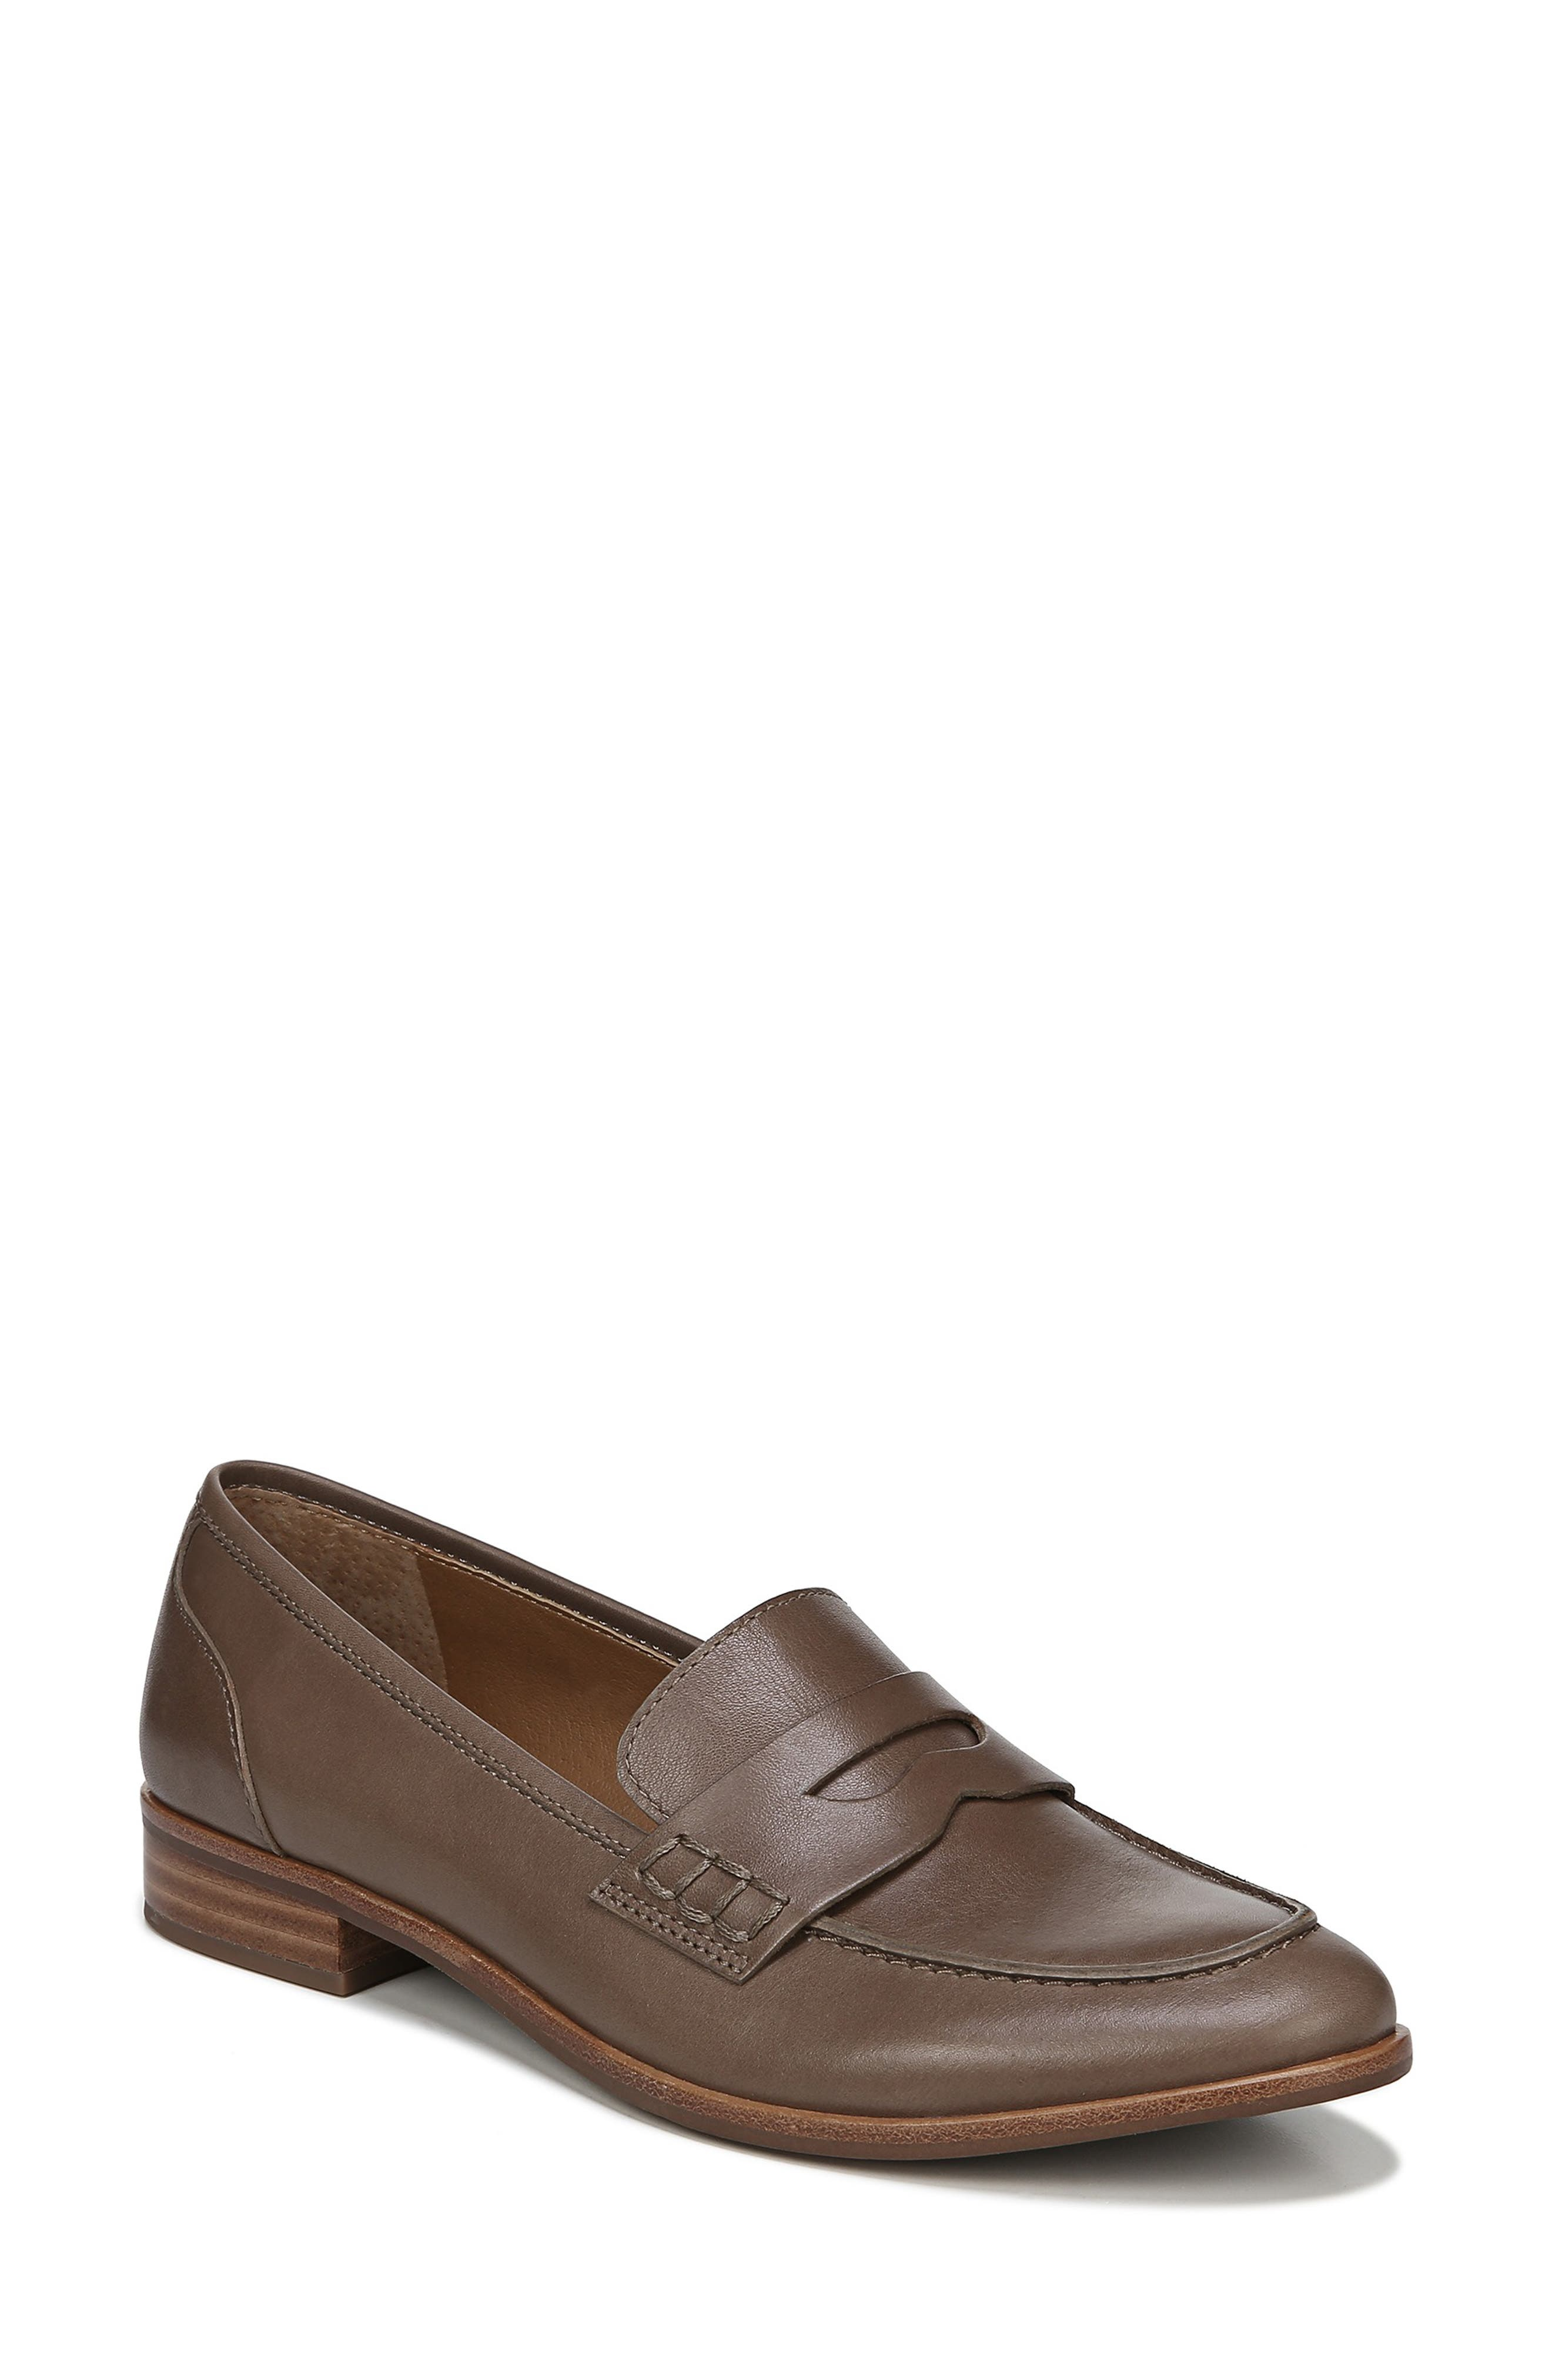 d517dde0bf8 SARTO By Franco Sarto Women s Shoes